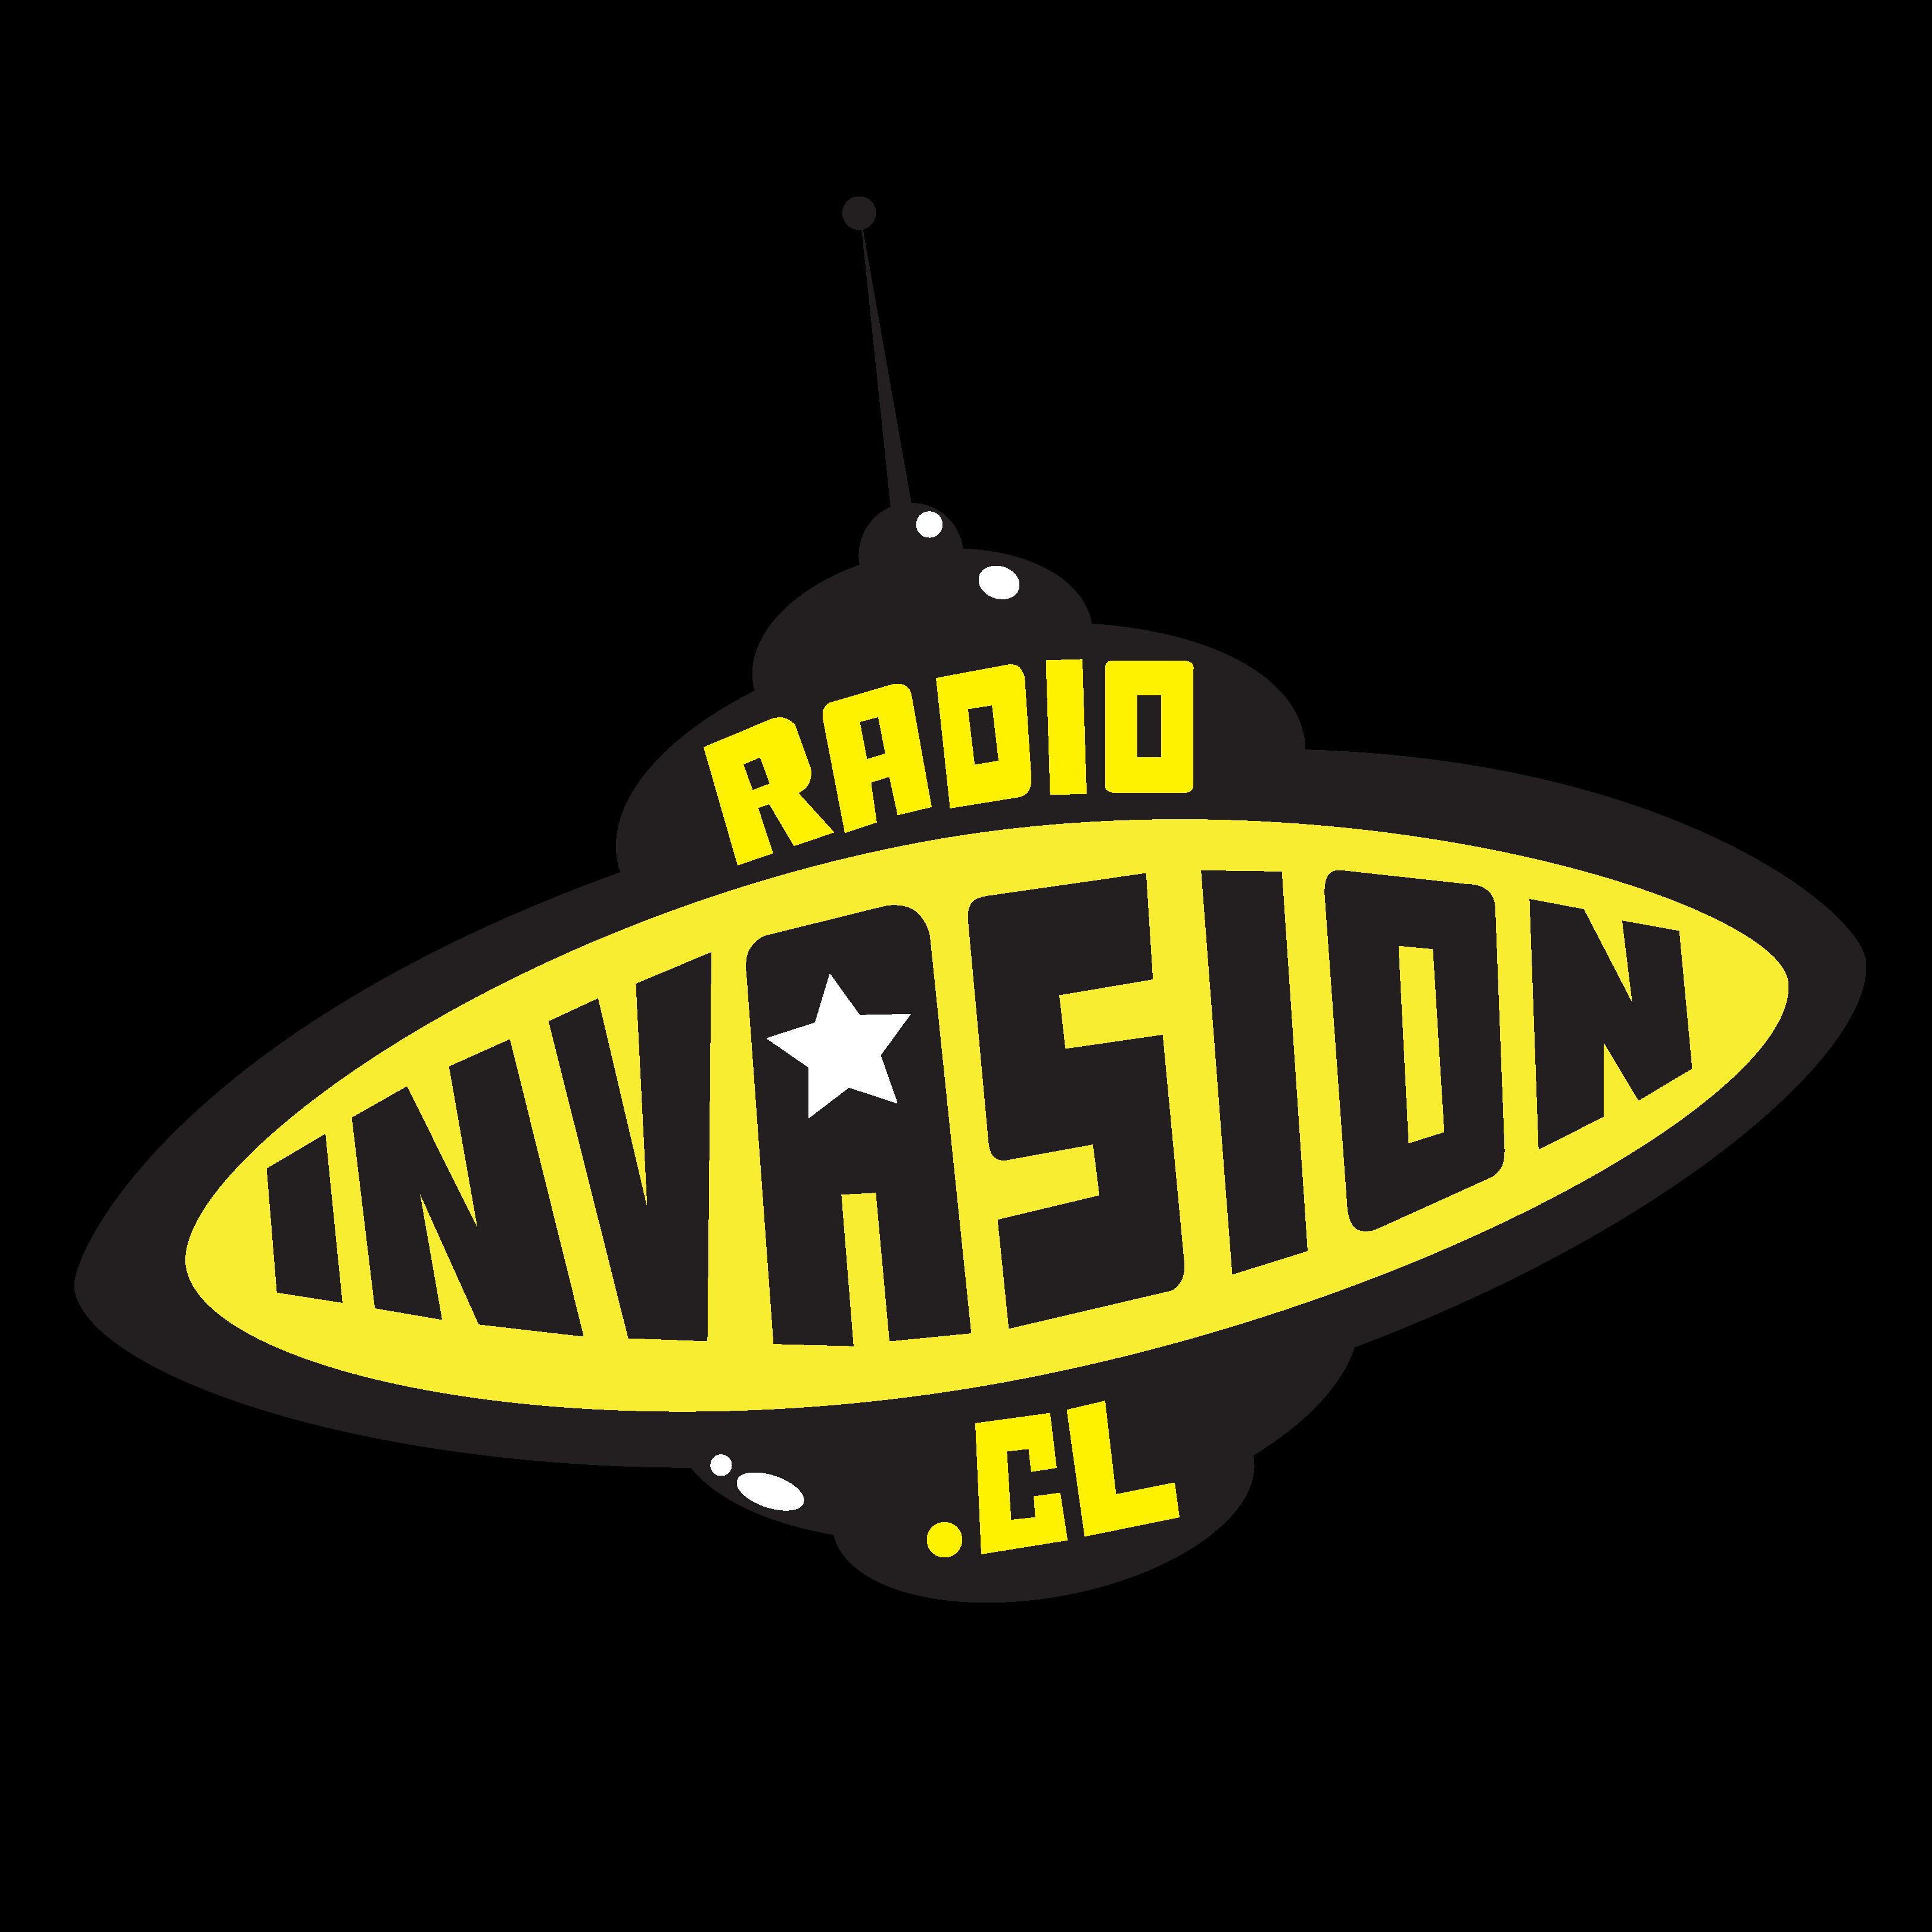 Radio Invasion Chile // The Hitz Channel